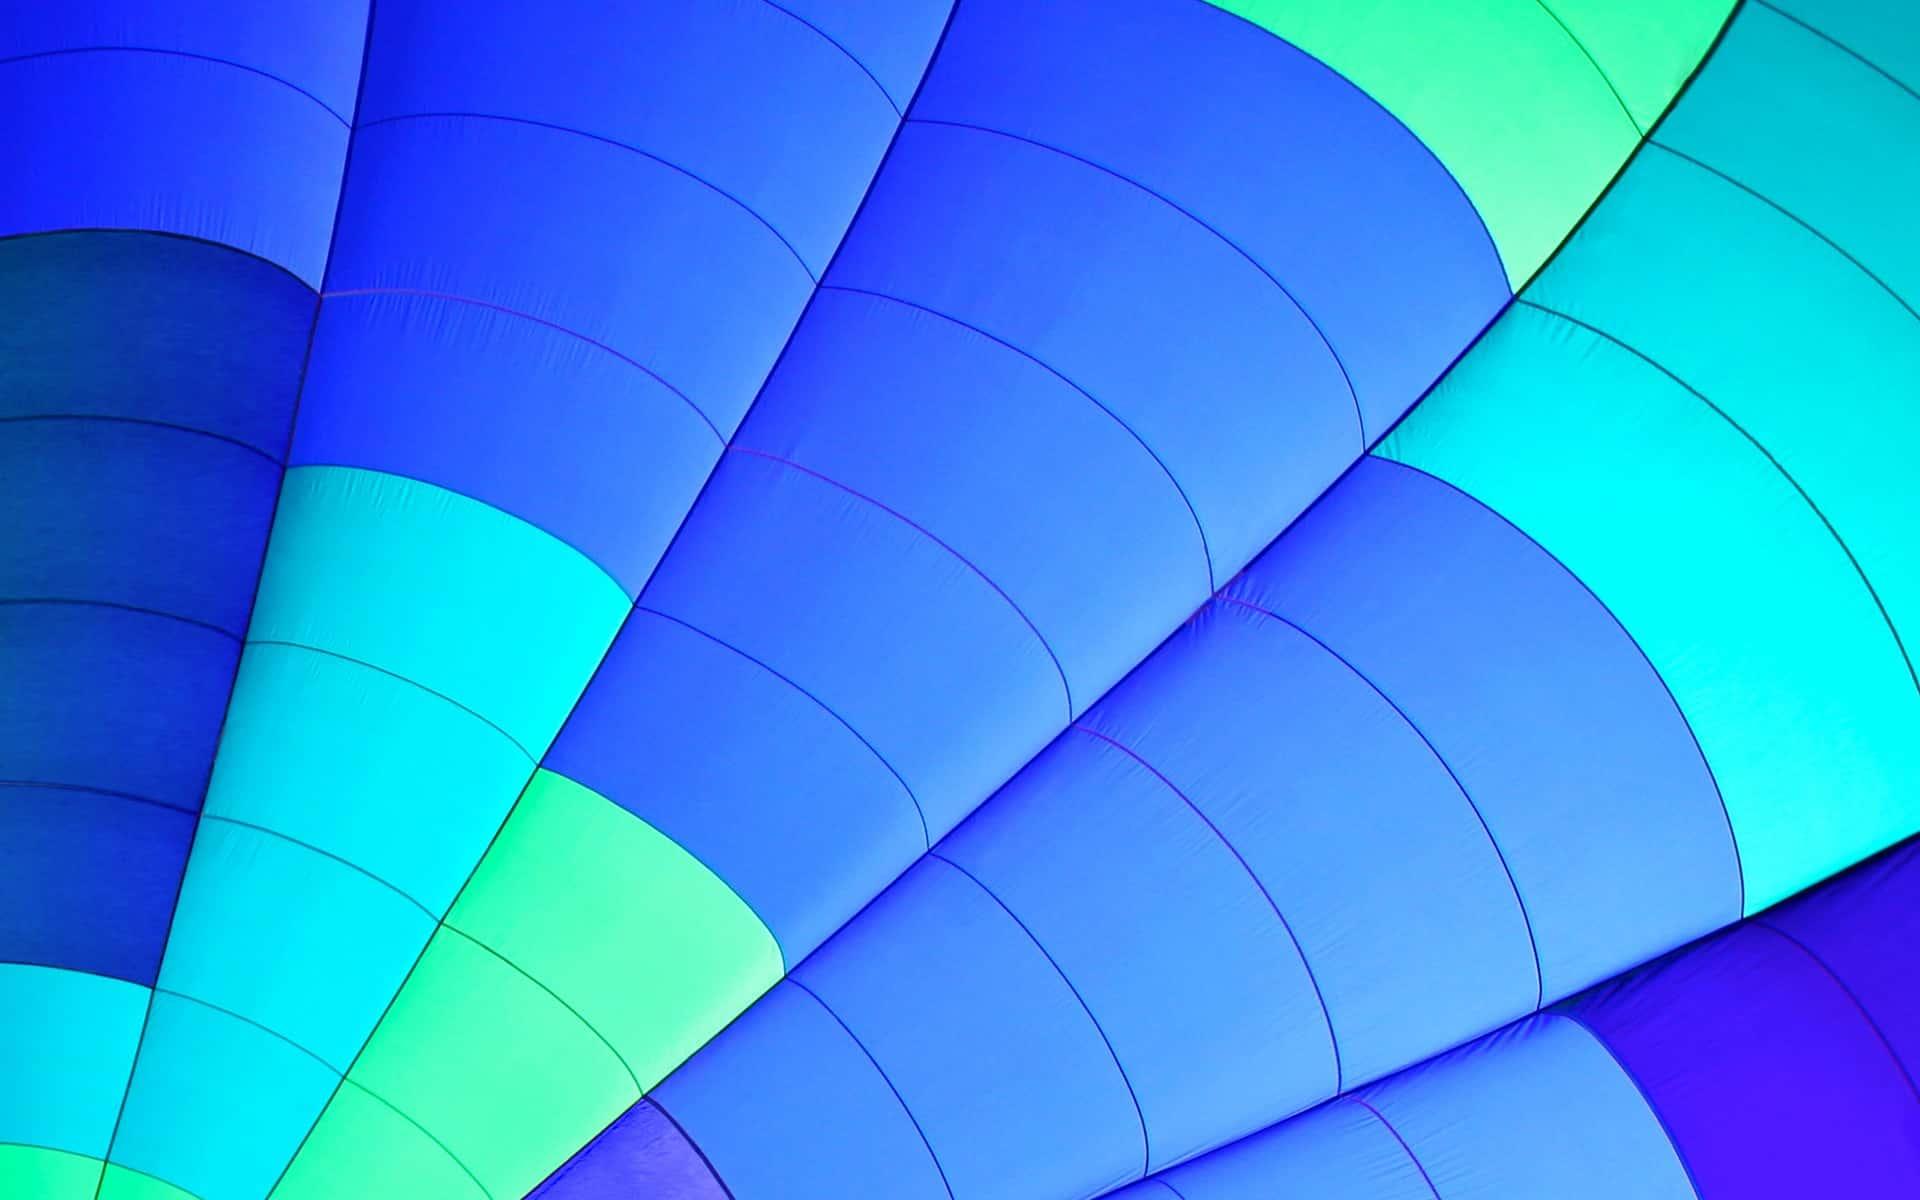 Windows 10 Stock Wallpapers - Windows 8 Wallpaper Official - HD Wallpaper